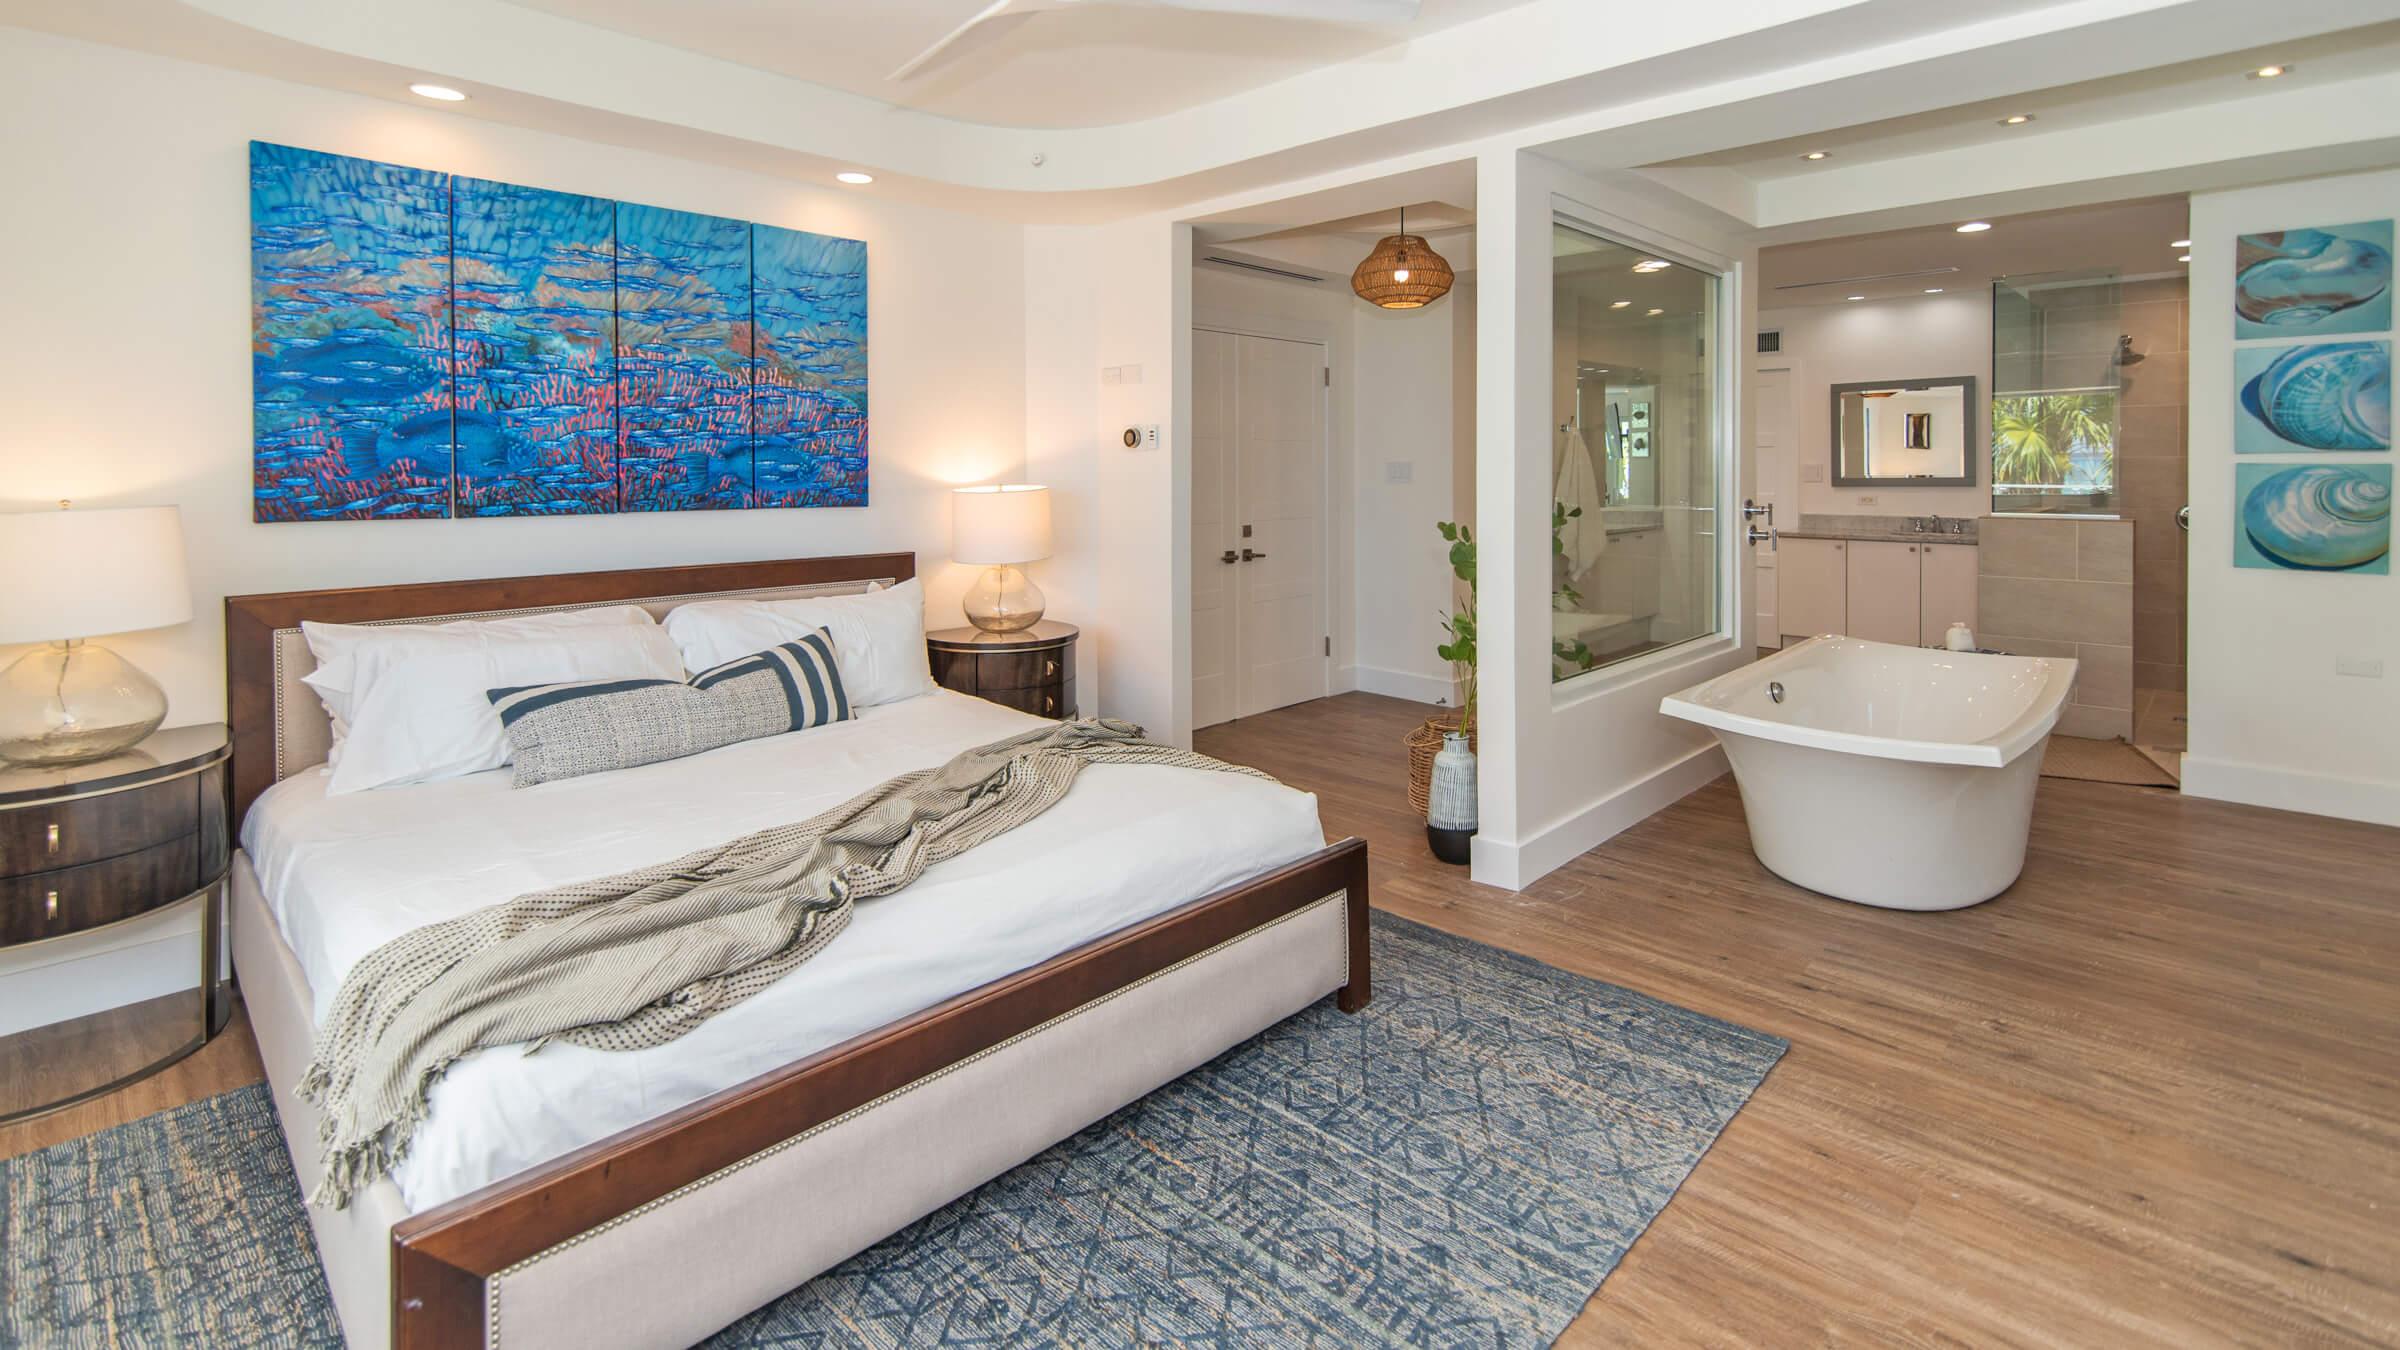 Seascape-Villa-Beach-Villa-Cayman-Islands-Grand-Cayman-Paradise-Bedroom-and-Full-Bath.jpg